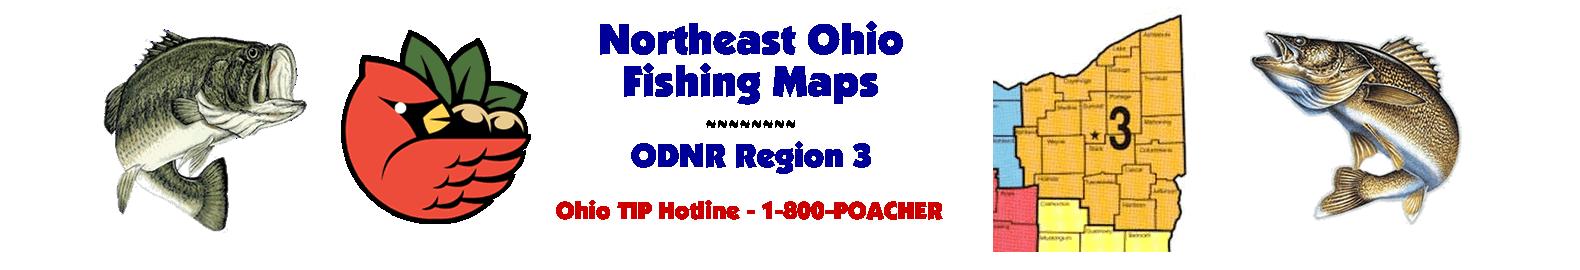 Northeast Ohio Fishing Maps - ODNR Region 3